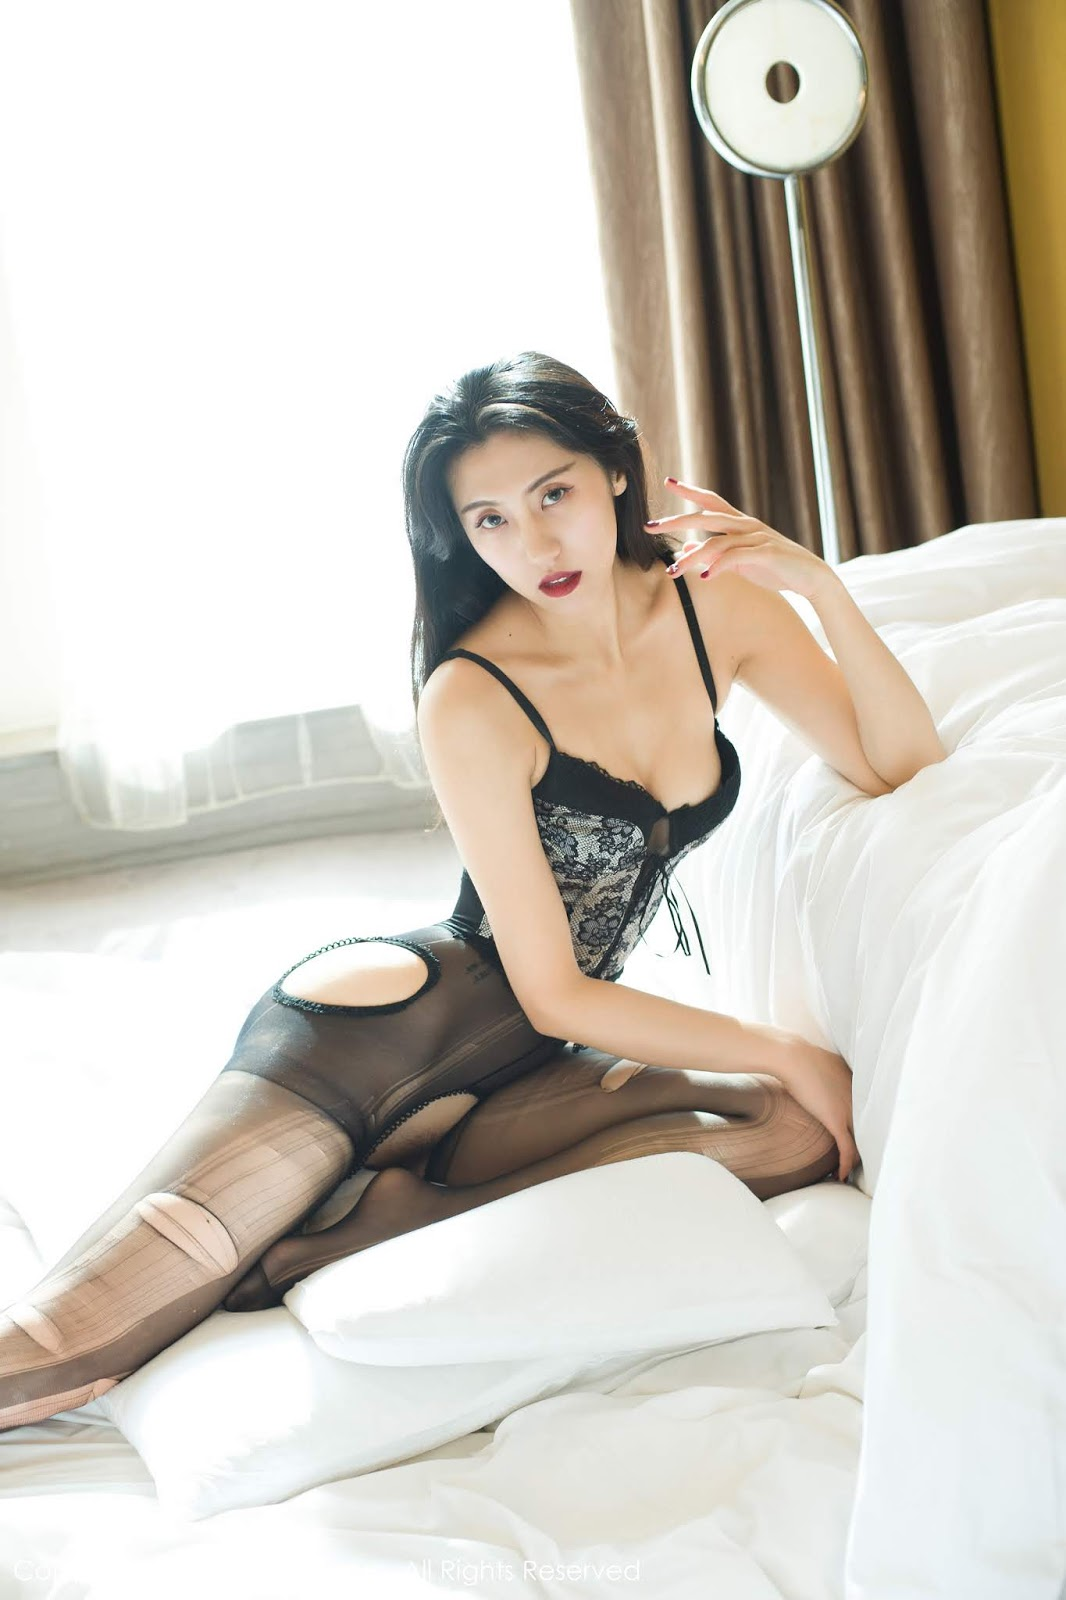 Cute Chinese Model Ran Bao Sexy Photoshots - Asian Hot